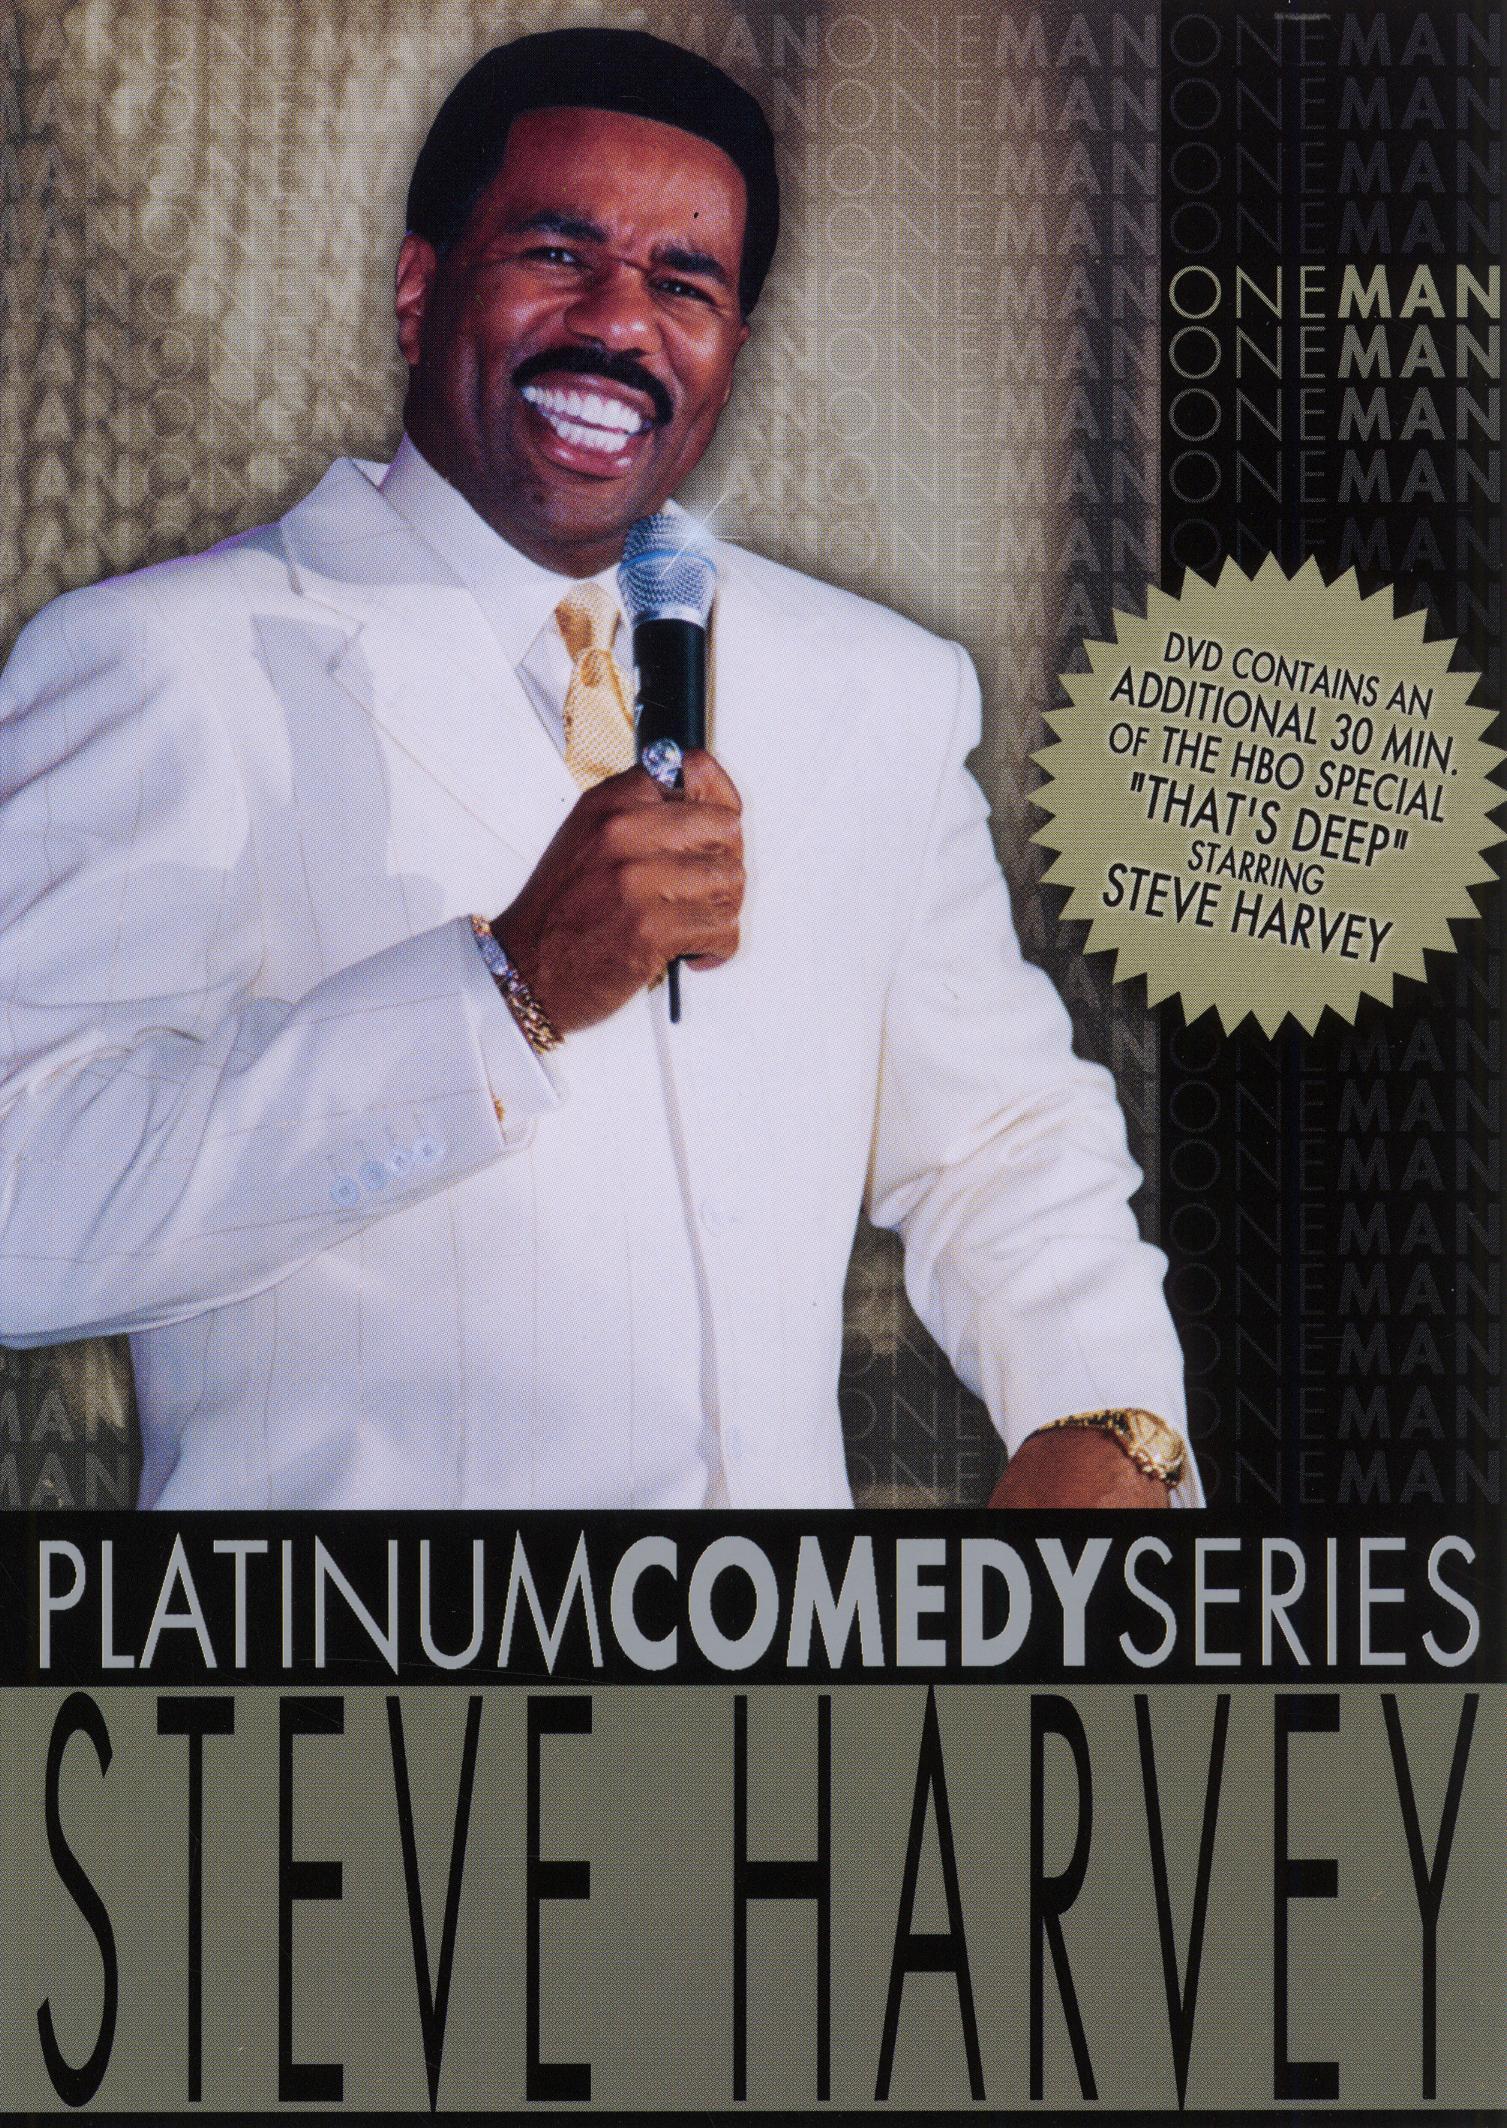 Platinum Comedy Series: Alex Thomas - Straight Clownin'